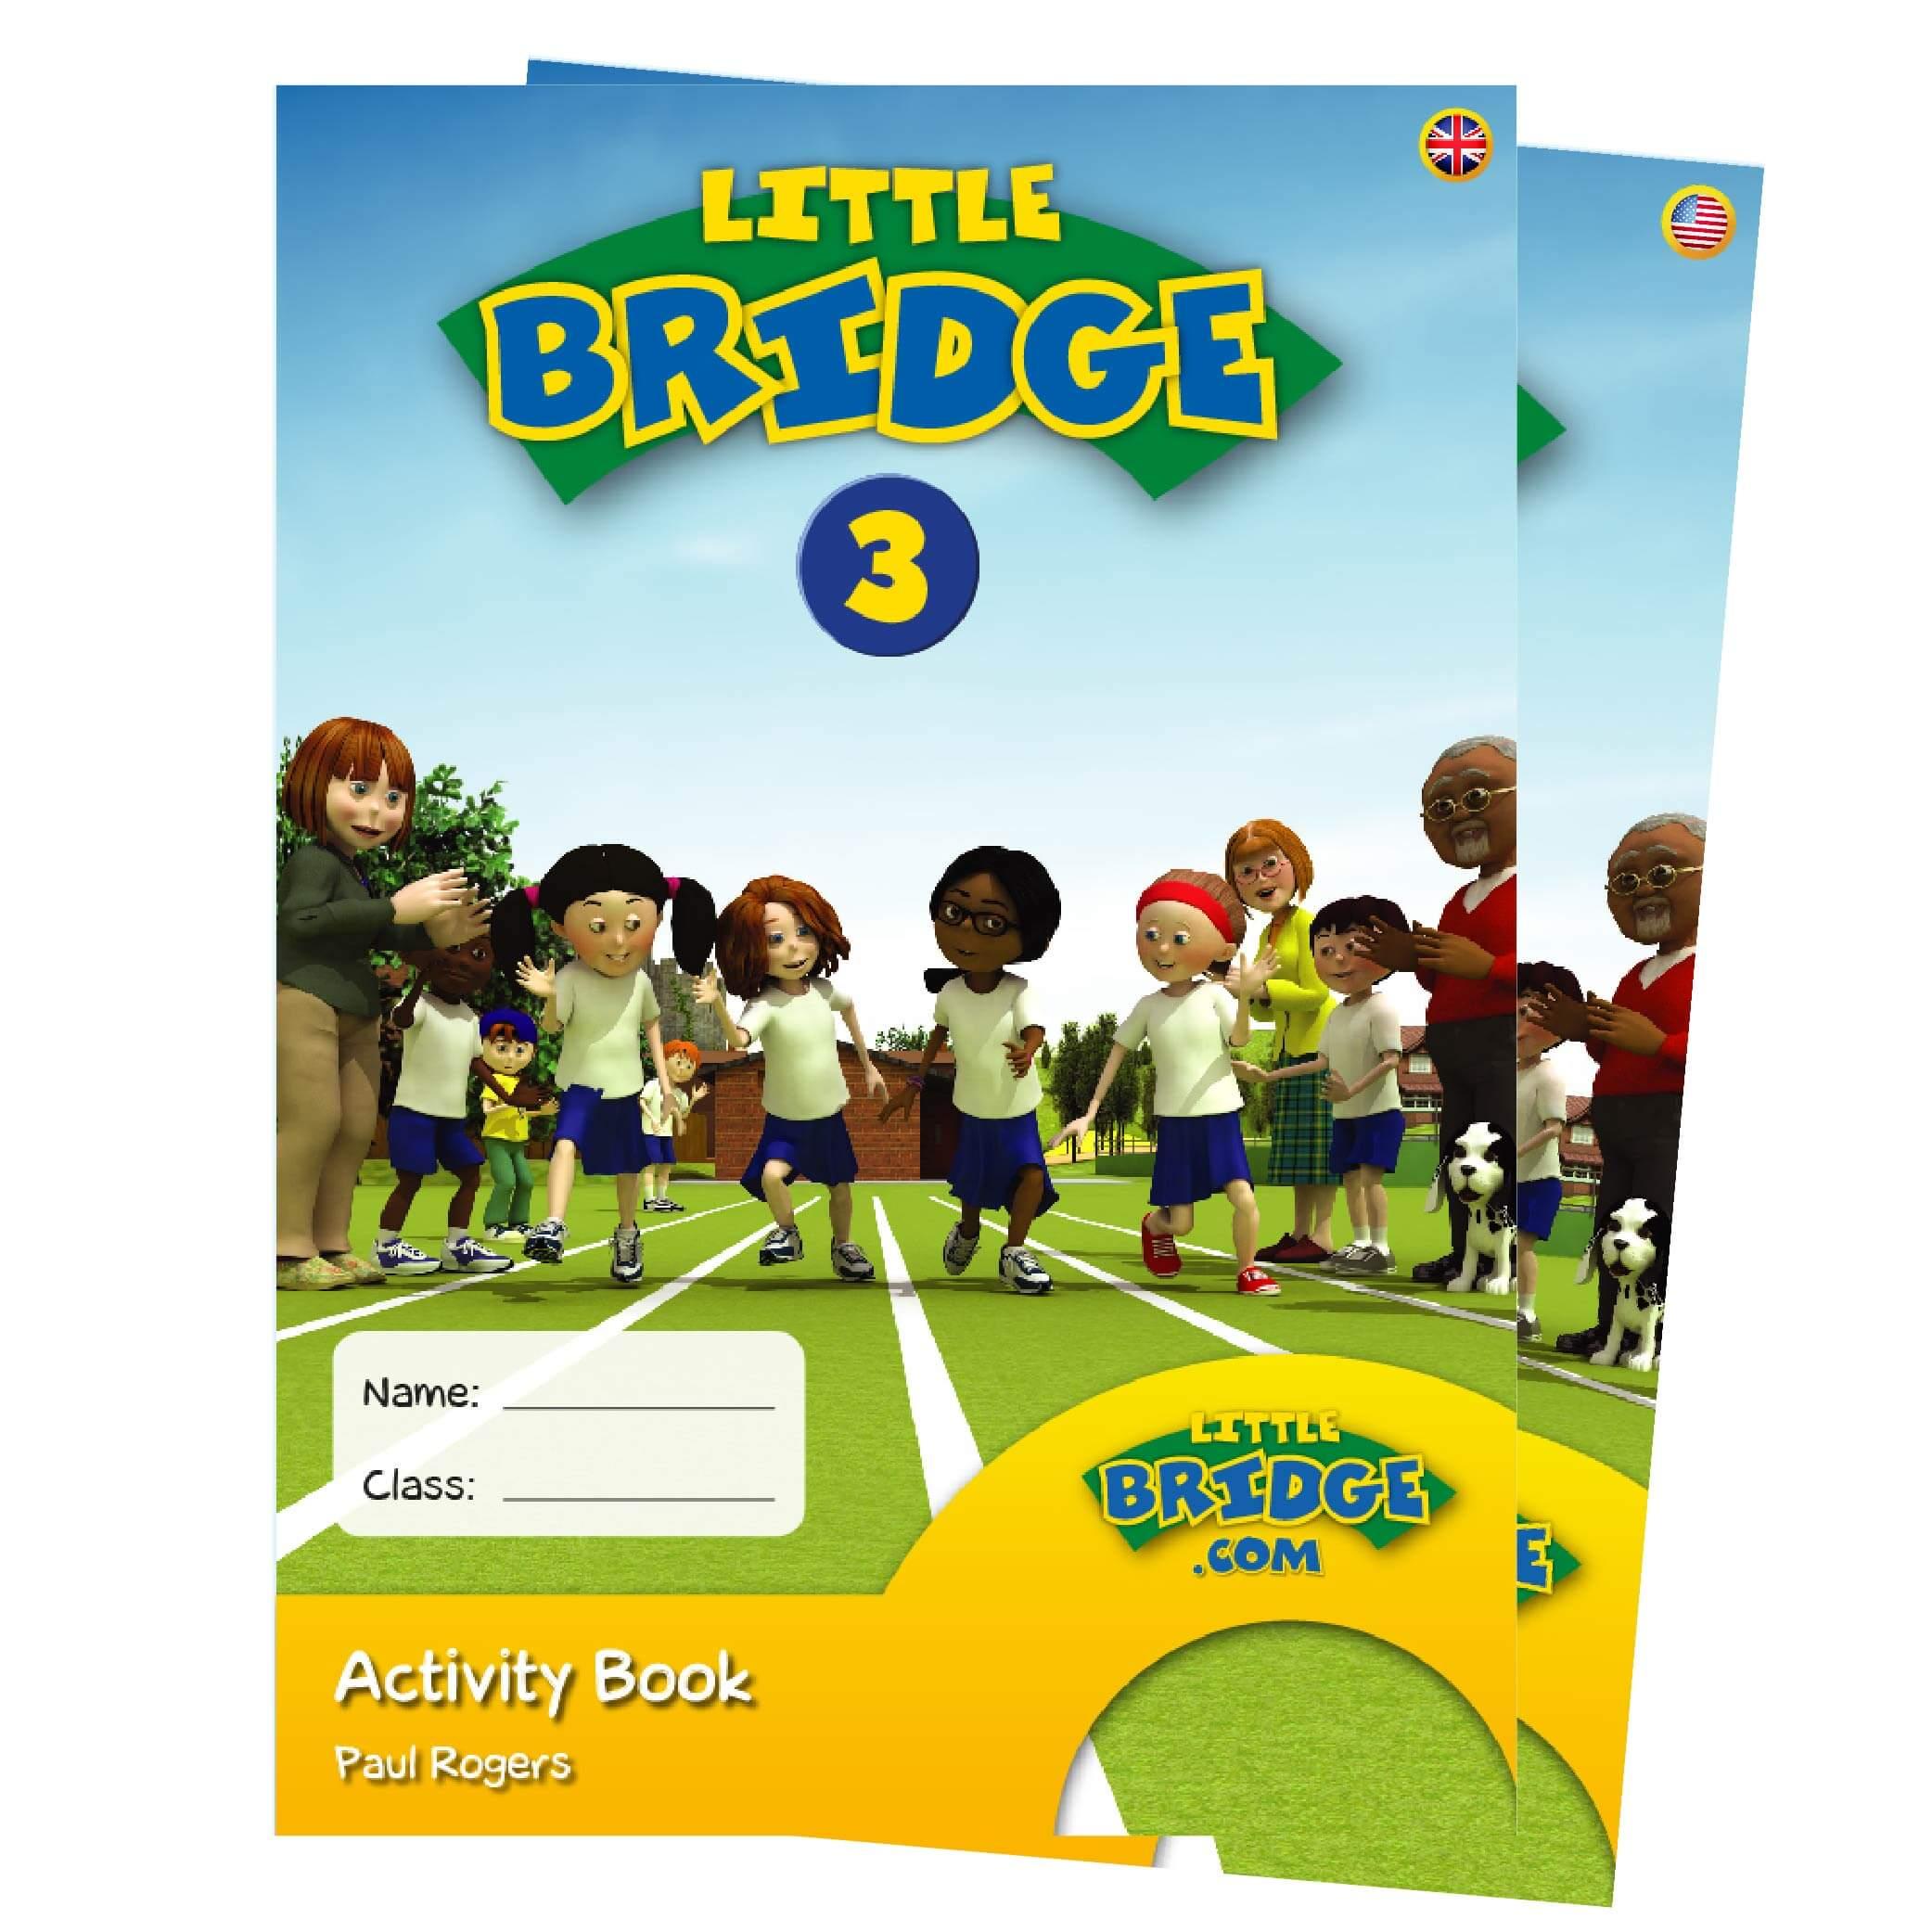 Little Bridge Activity Book Level 3 - Little Bridge